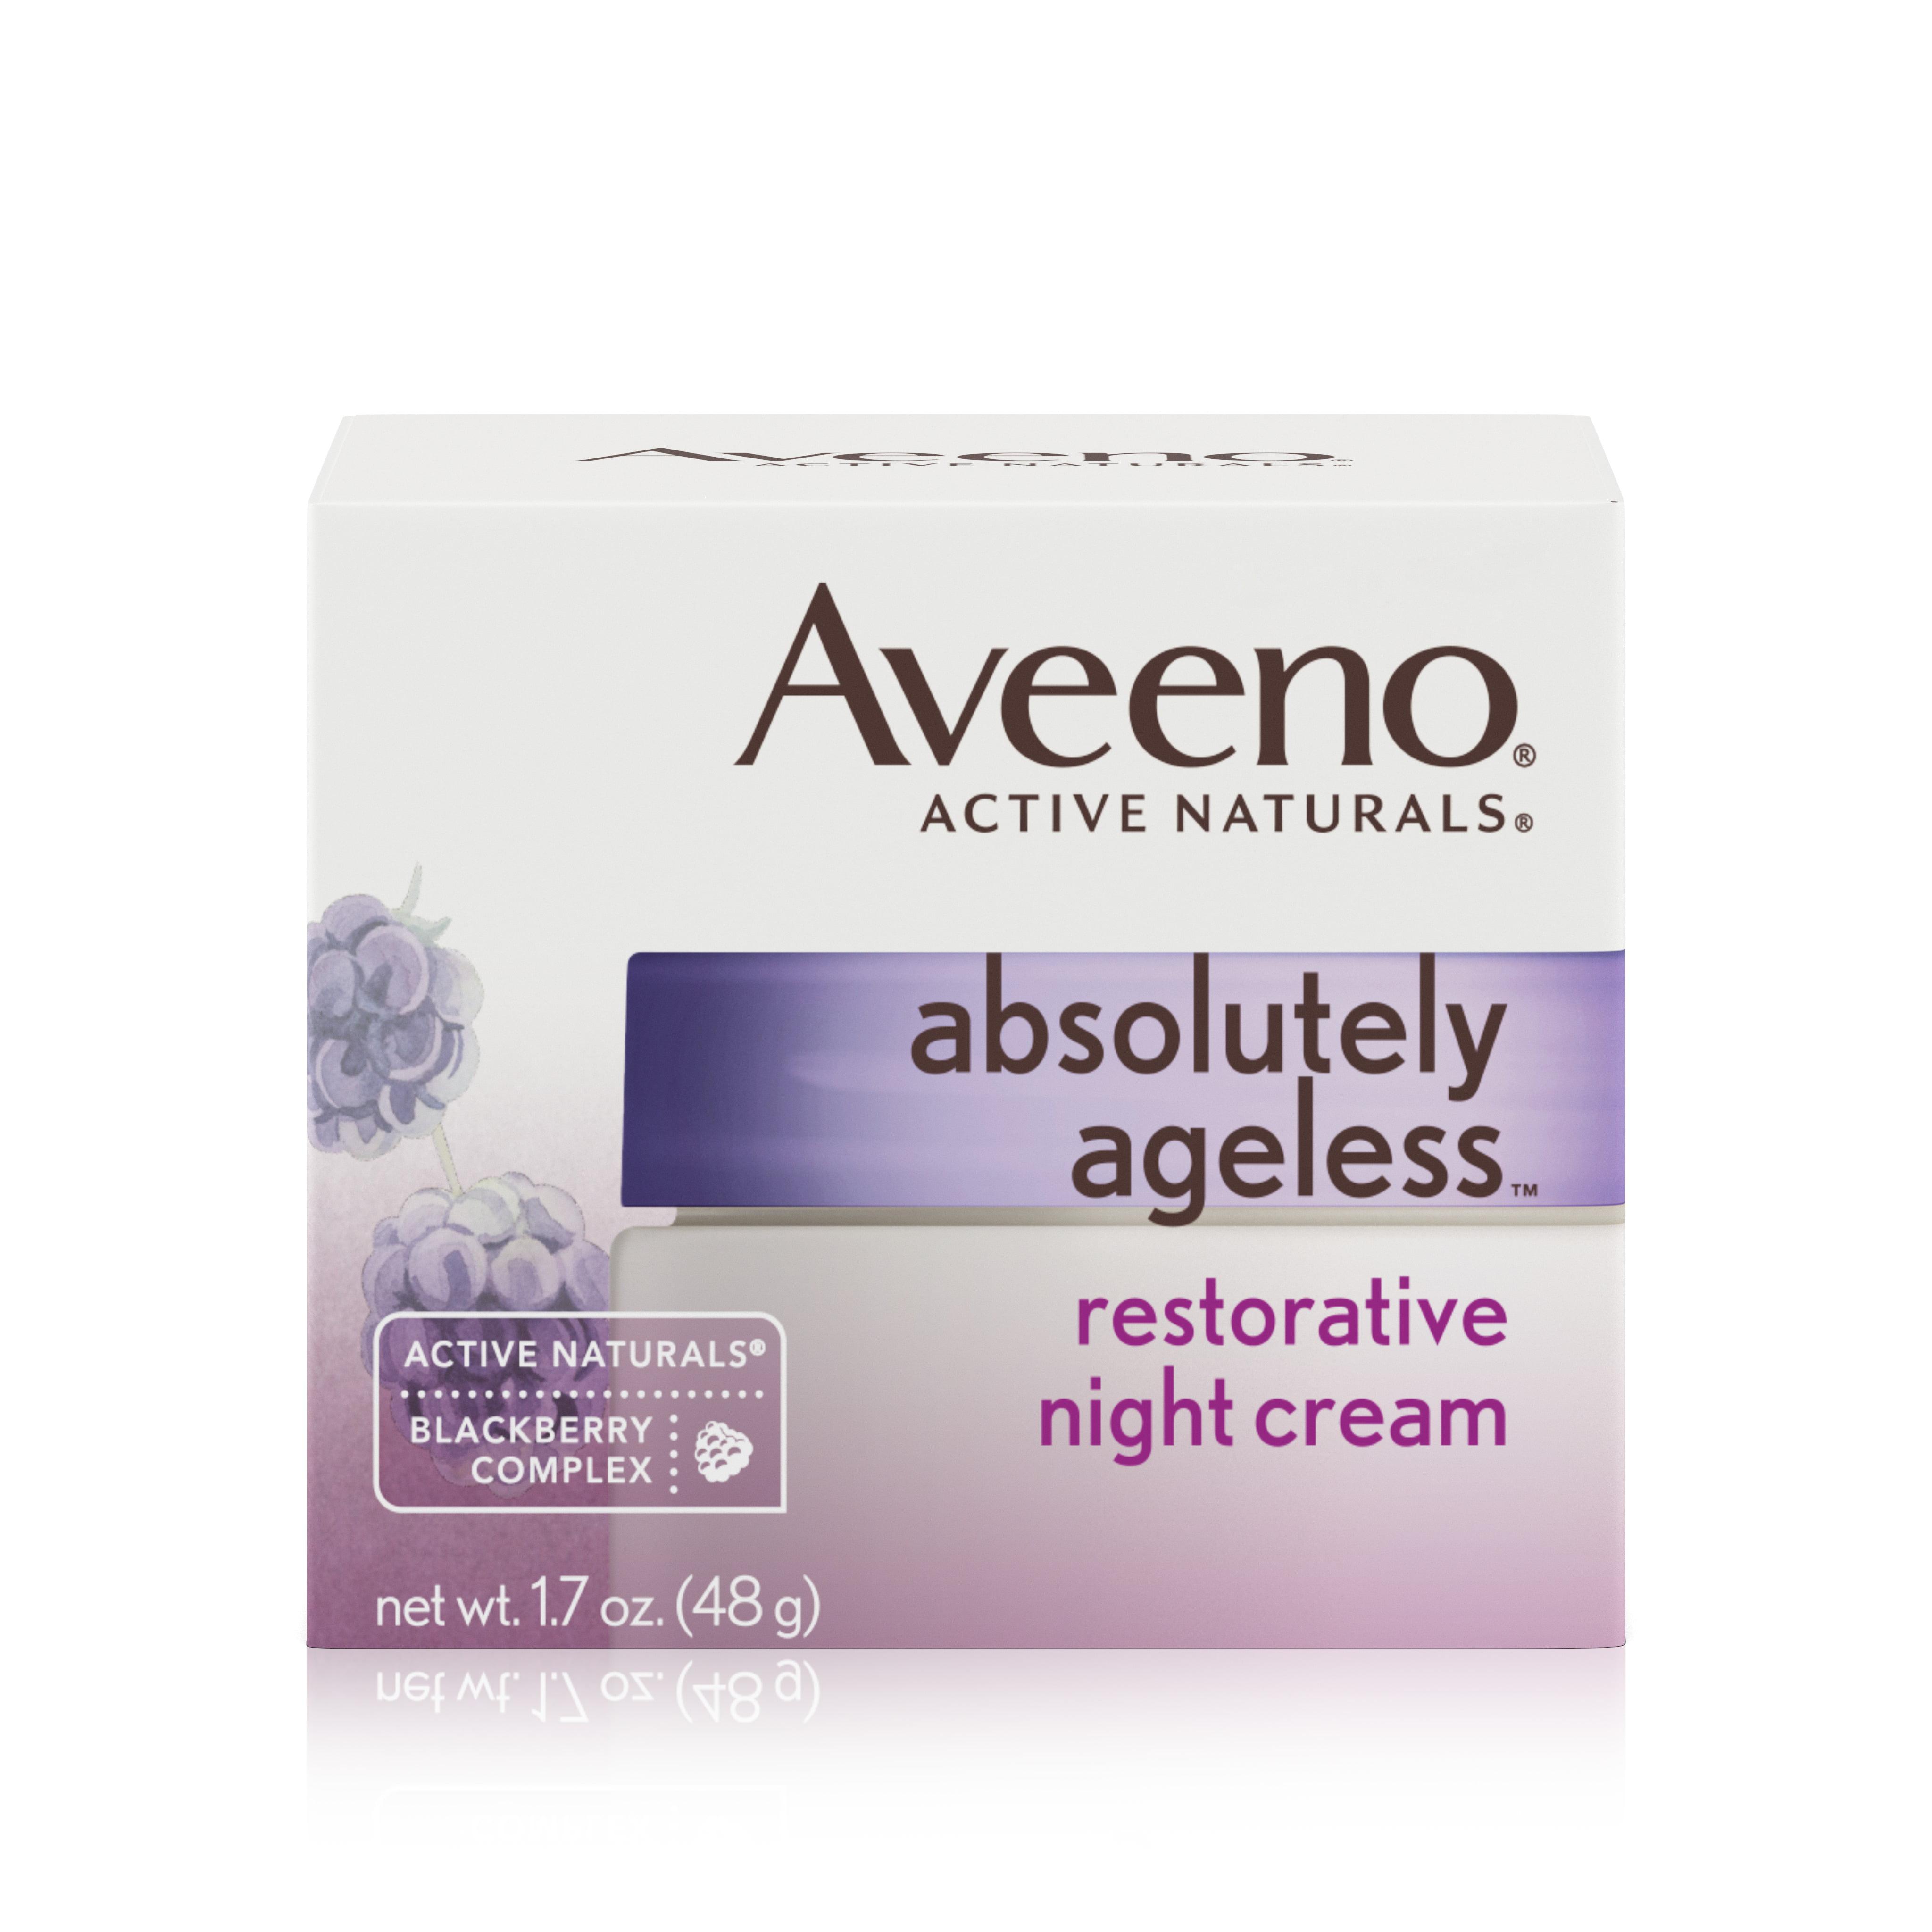 Aveeno Absolutely Ageless Restorative Facial Anti-Aging Night Cream, 1.7 Oz by Johnson & Johnson Consumer Inc.